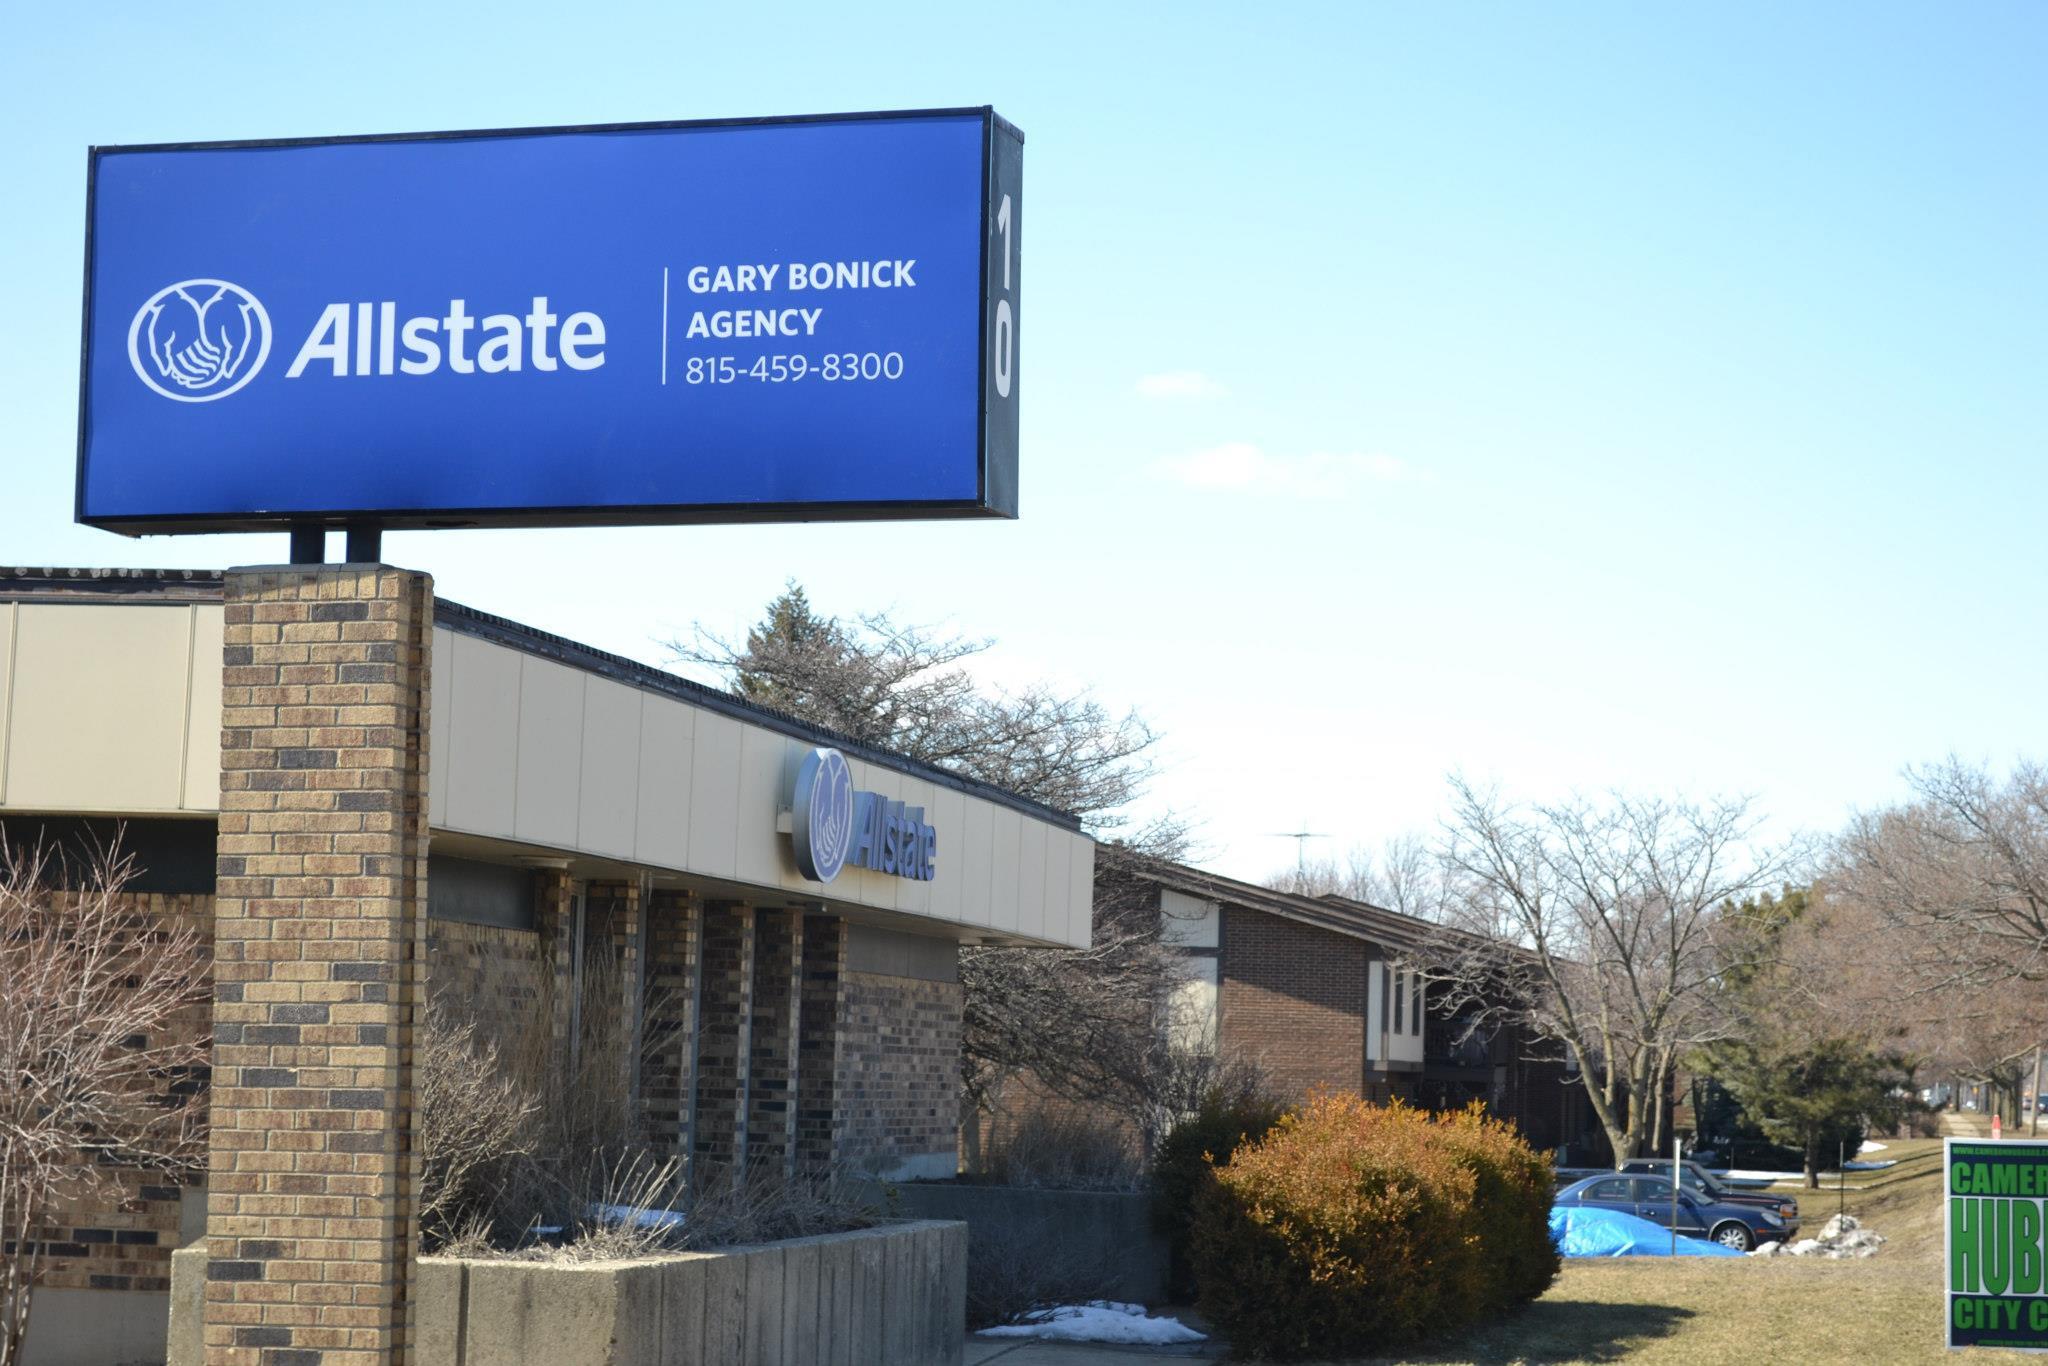 Gary Bonick: Allstate Insurance image 4